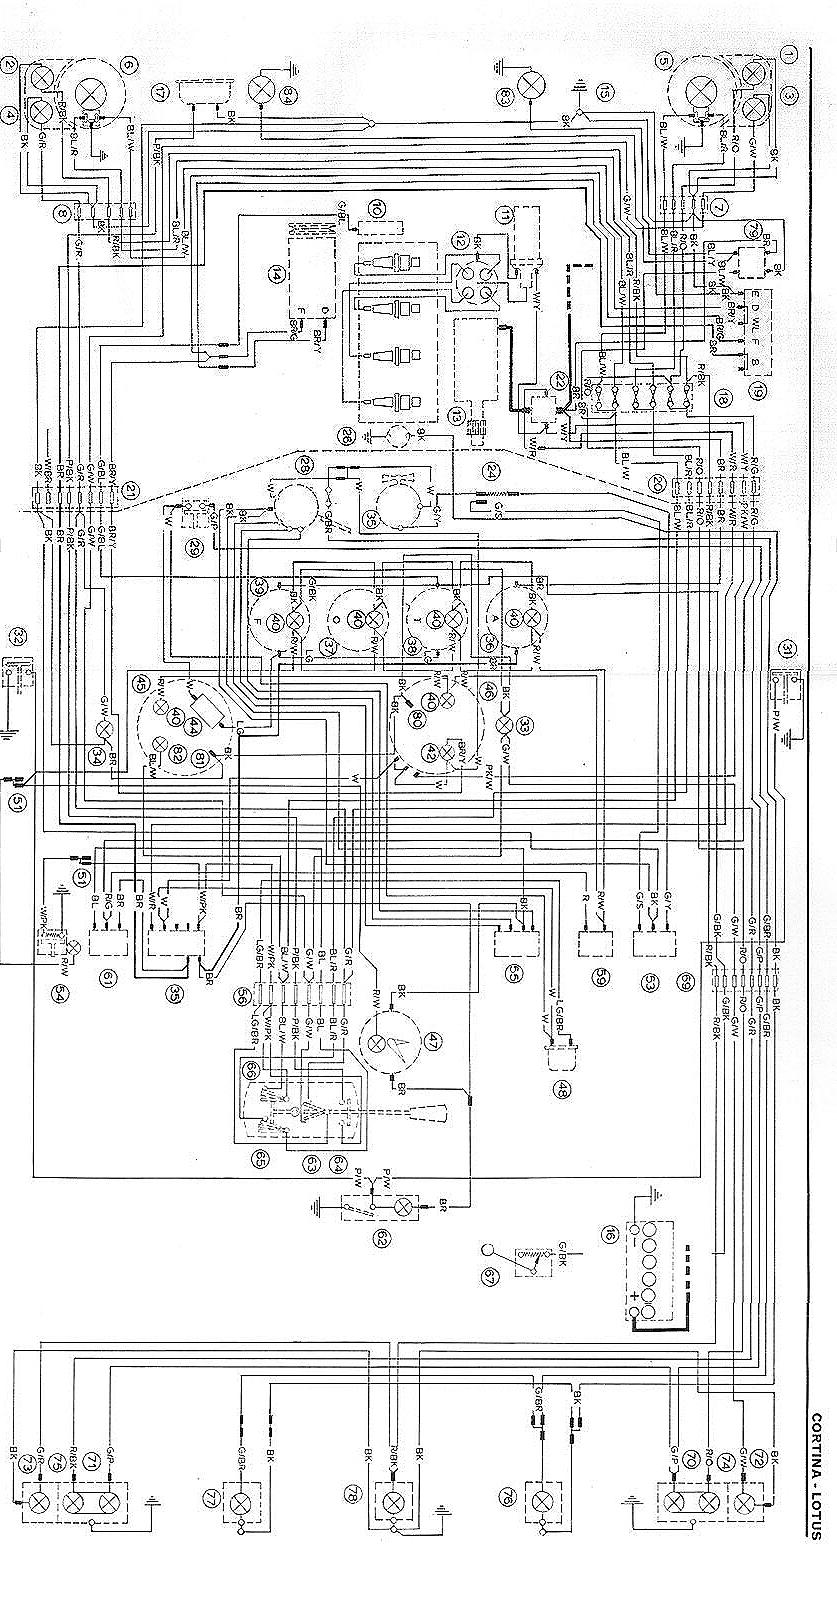 hight resolution of escort power cord wiring diagram mk2 wiring diagram diagrams and ford focus 19m